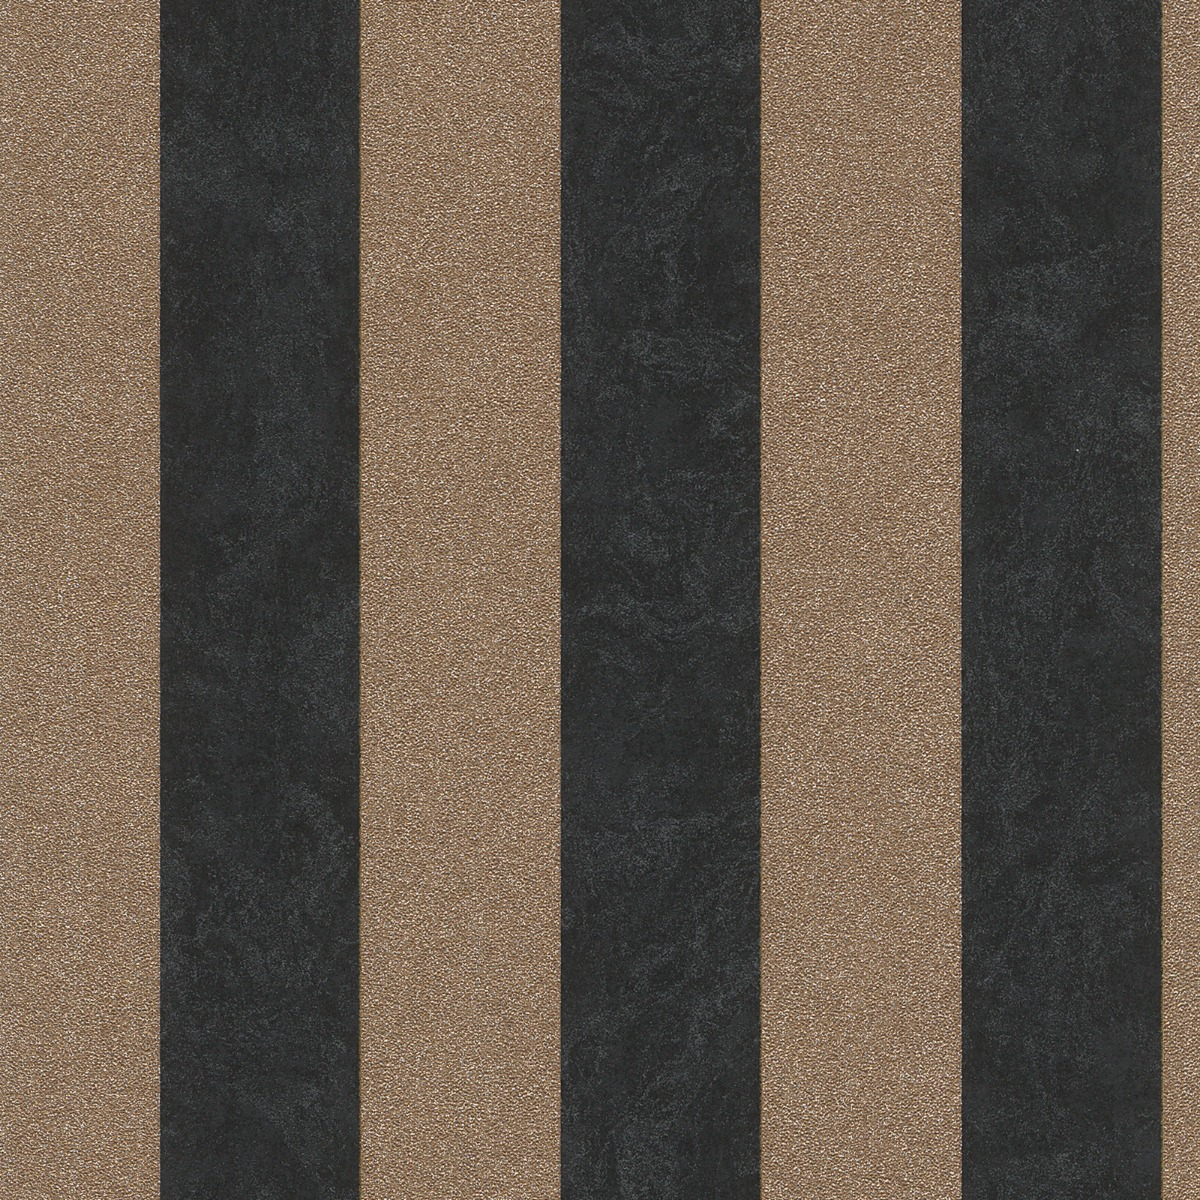 Carat Glitter Stripe Wallpaper Black and Gold